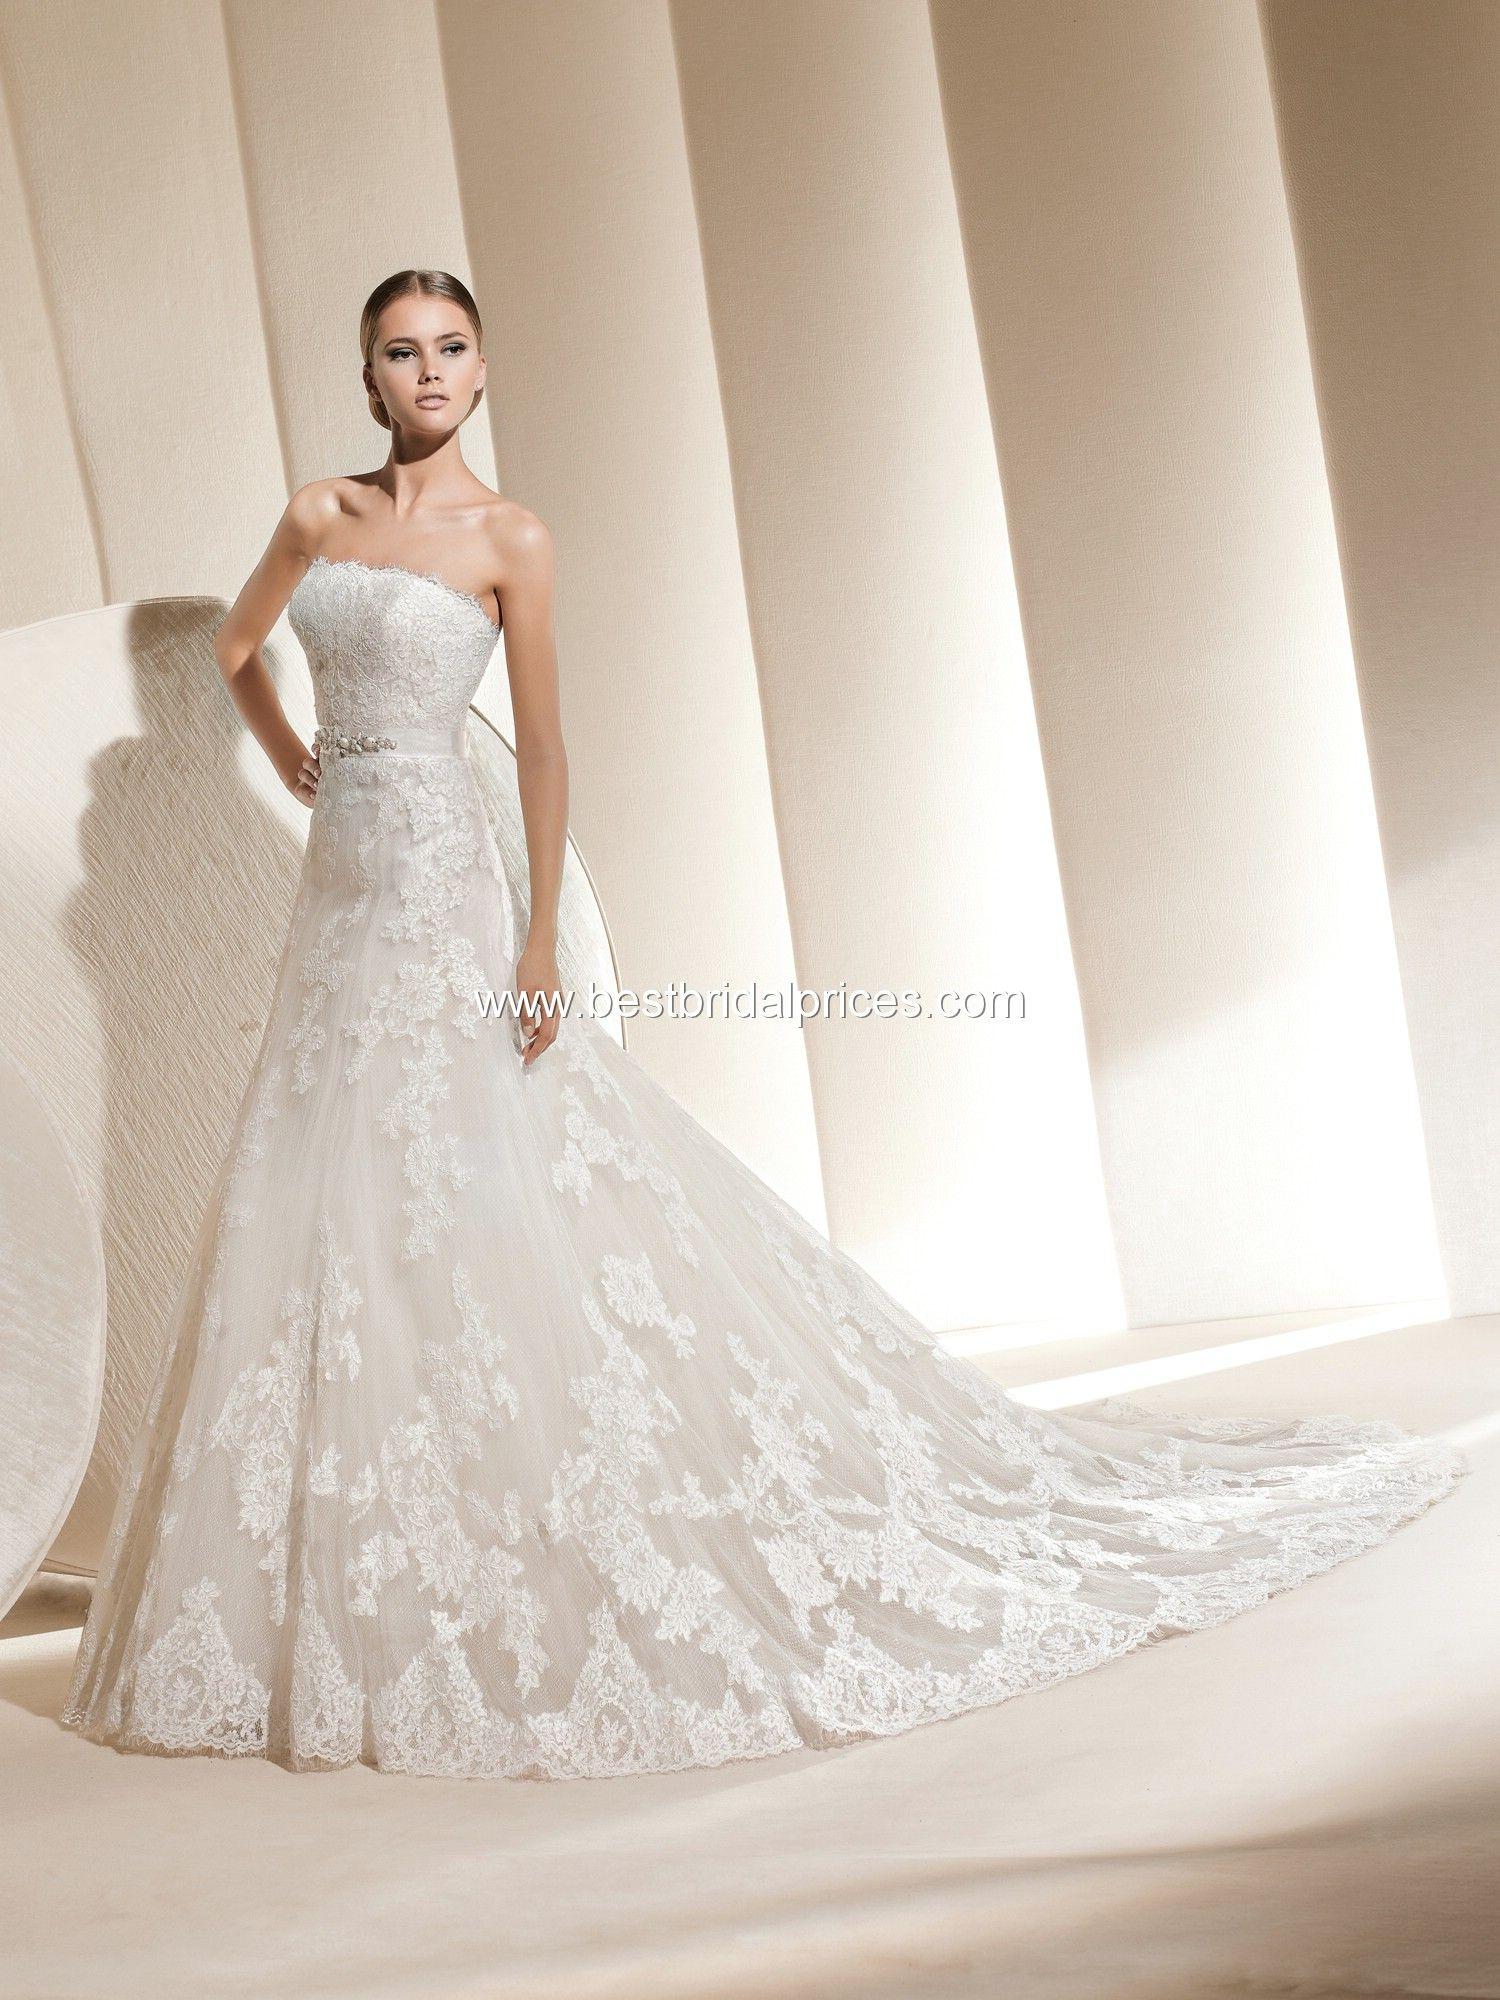 Trending prices of amelia sposa wedding dresses La Sposa Wedding Dresses Style Duarte